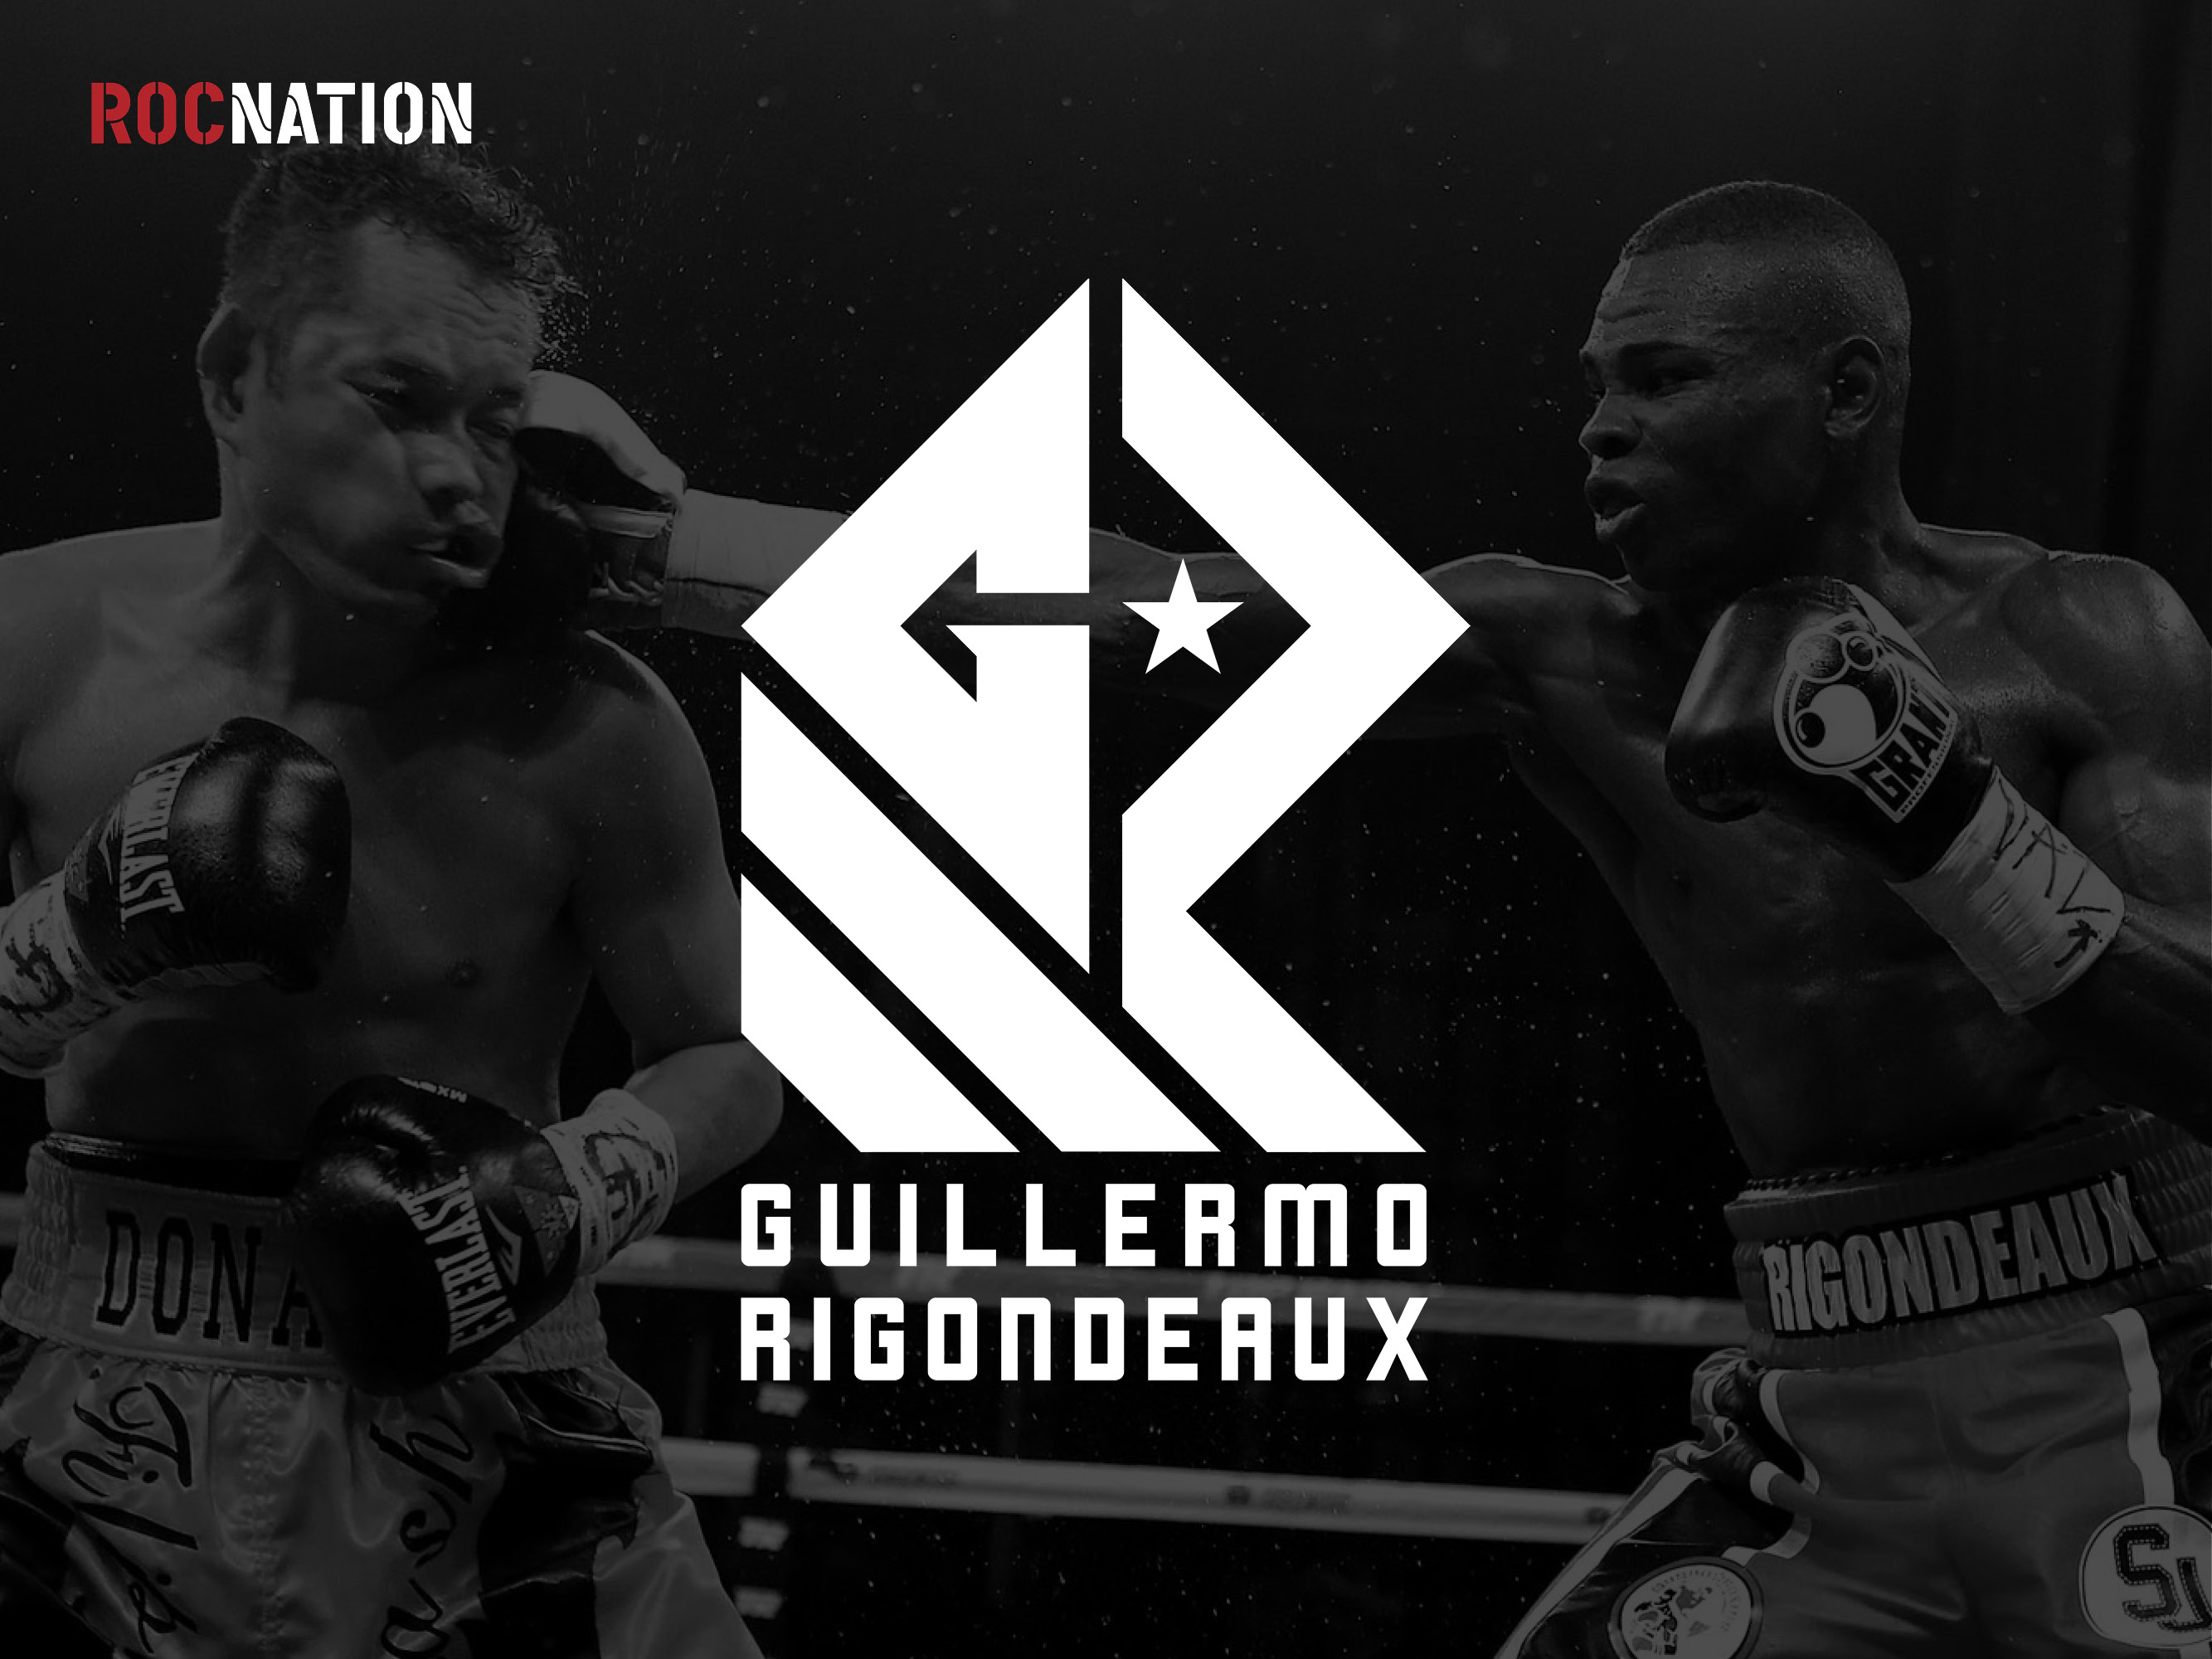 Guillermo Rigondeaux Rocnation athlete logo design